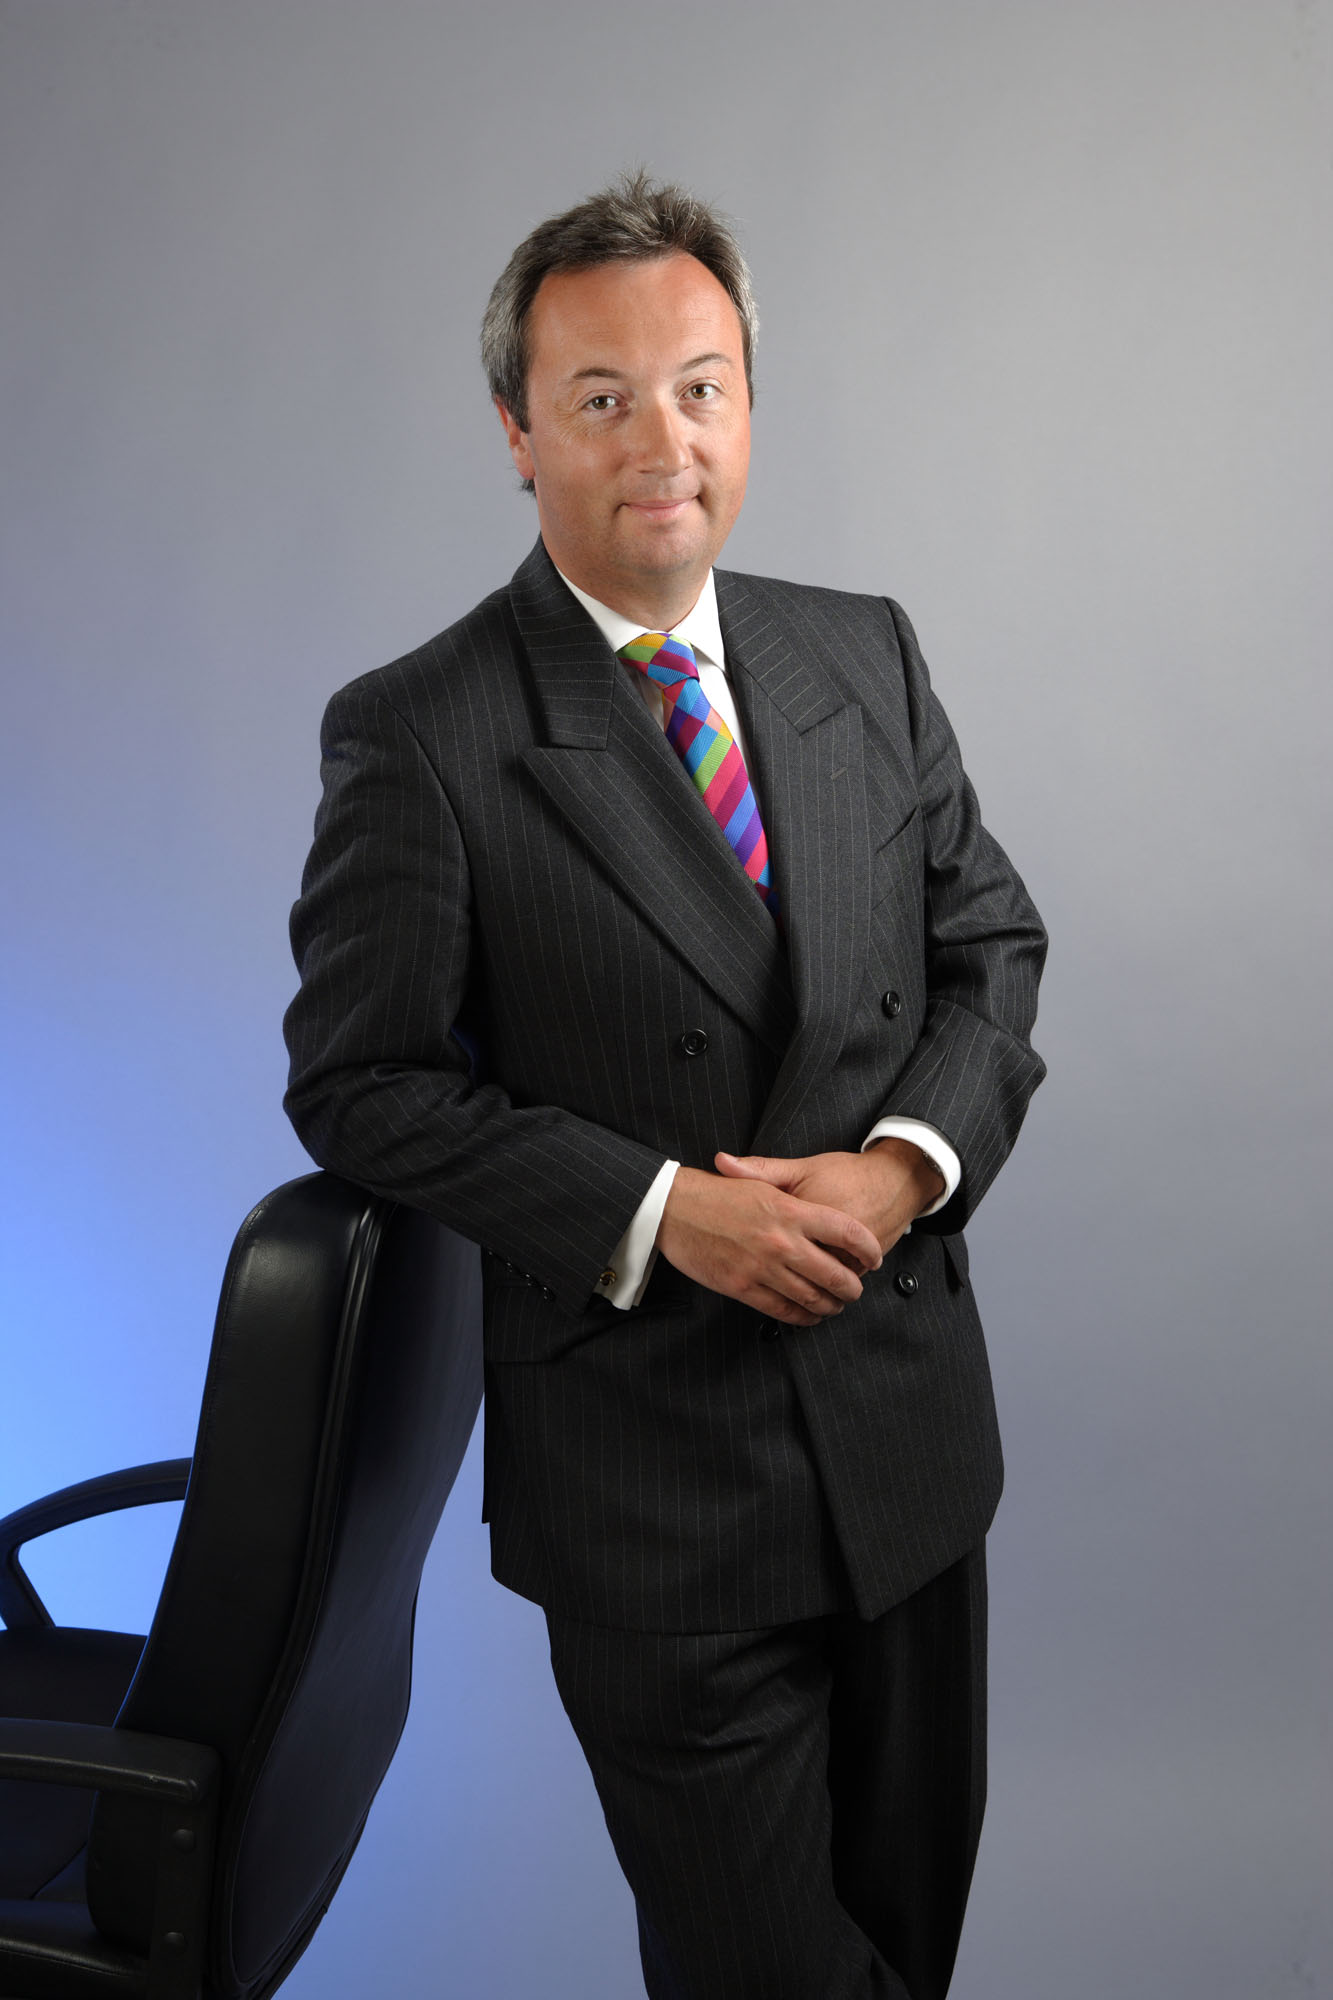 Peter Goatley